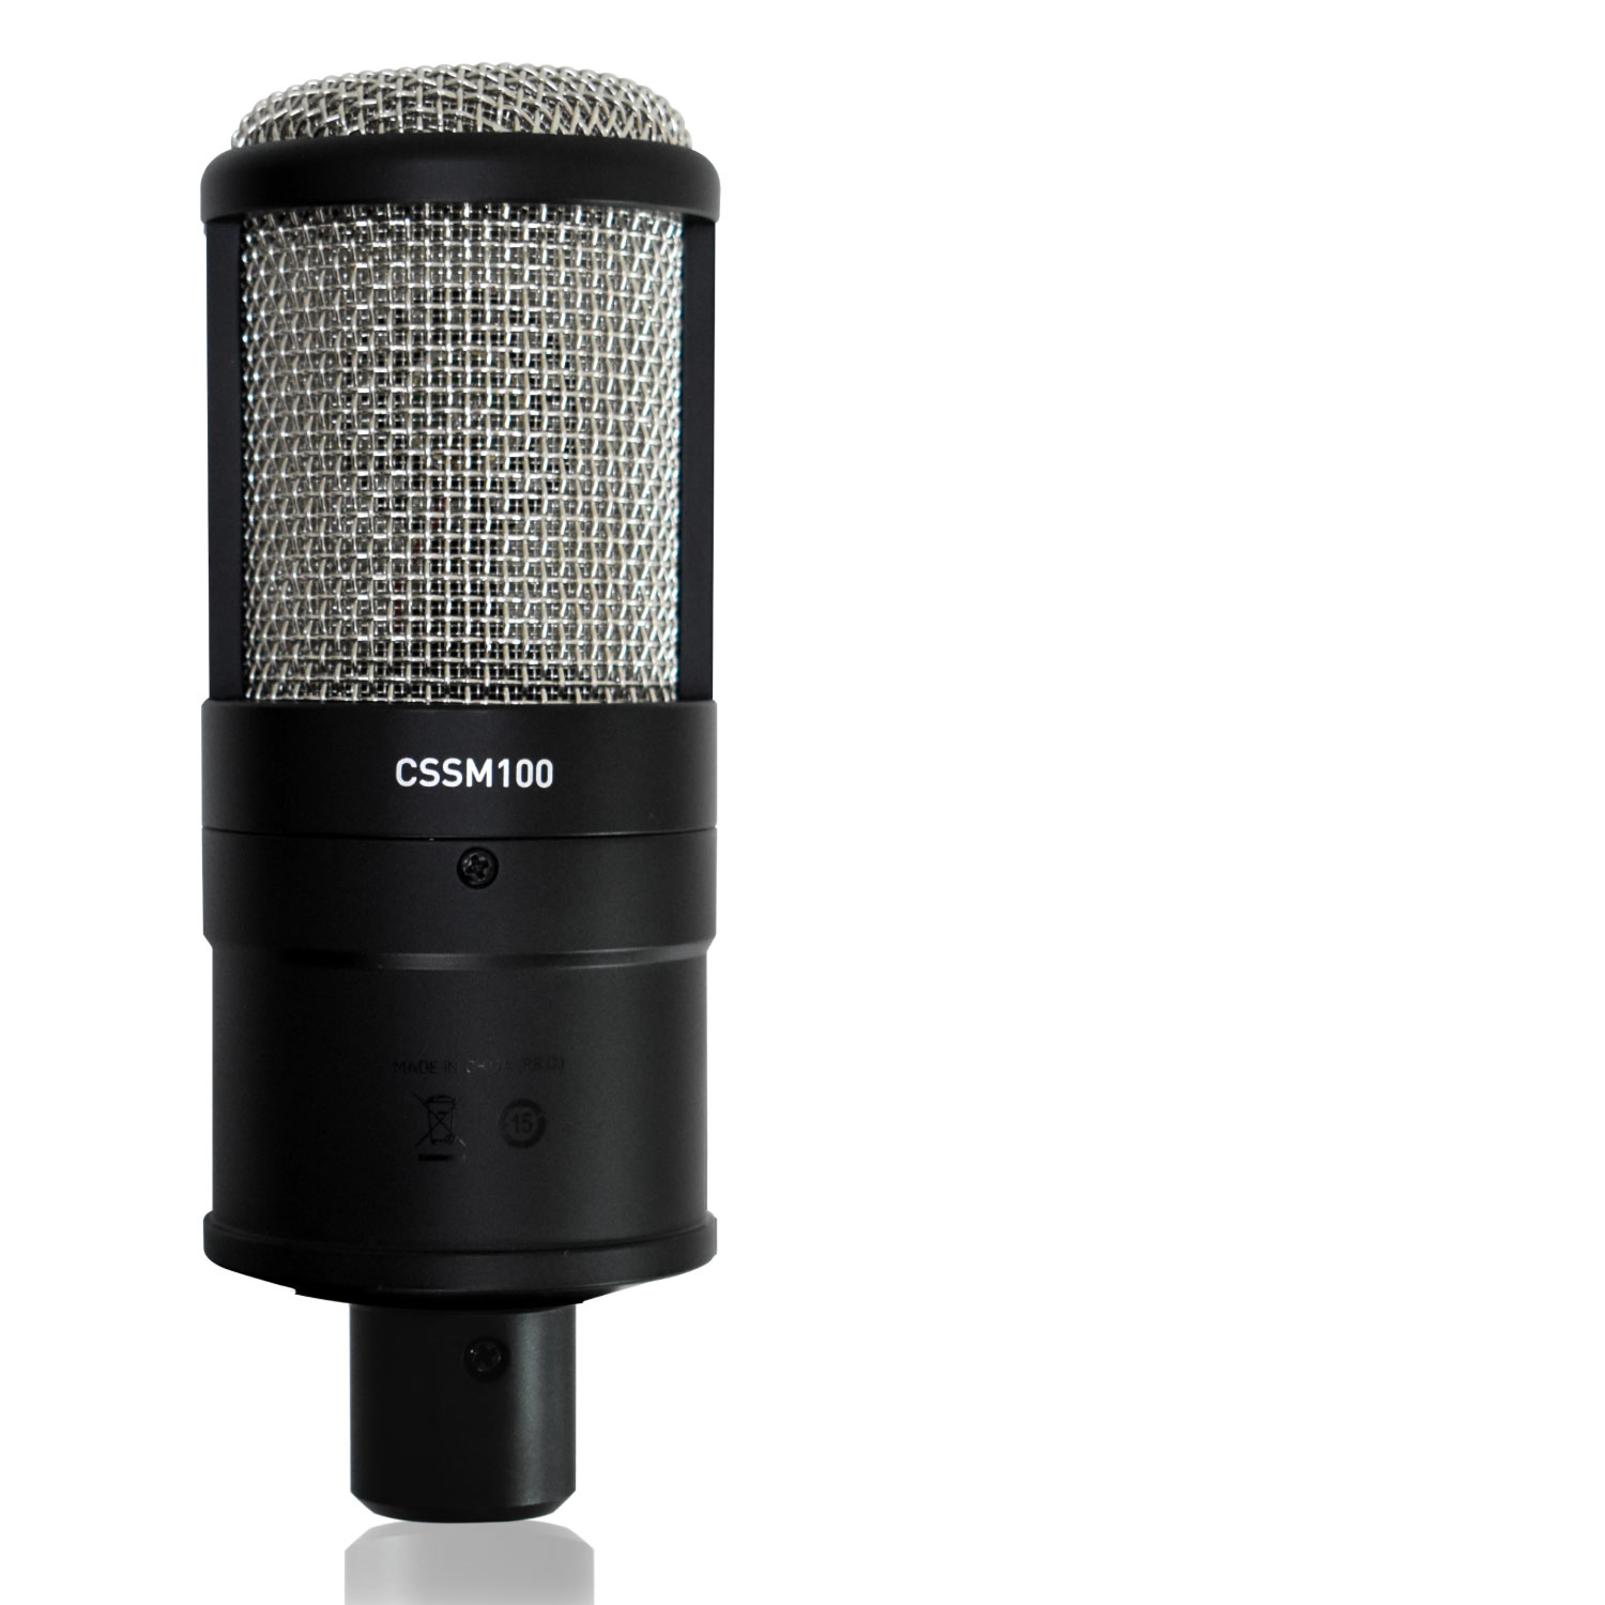 CSSM100 - Black - Studio Condenser Microphone - Detailshot 2